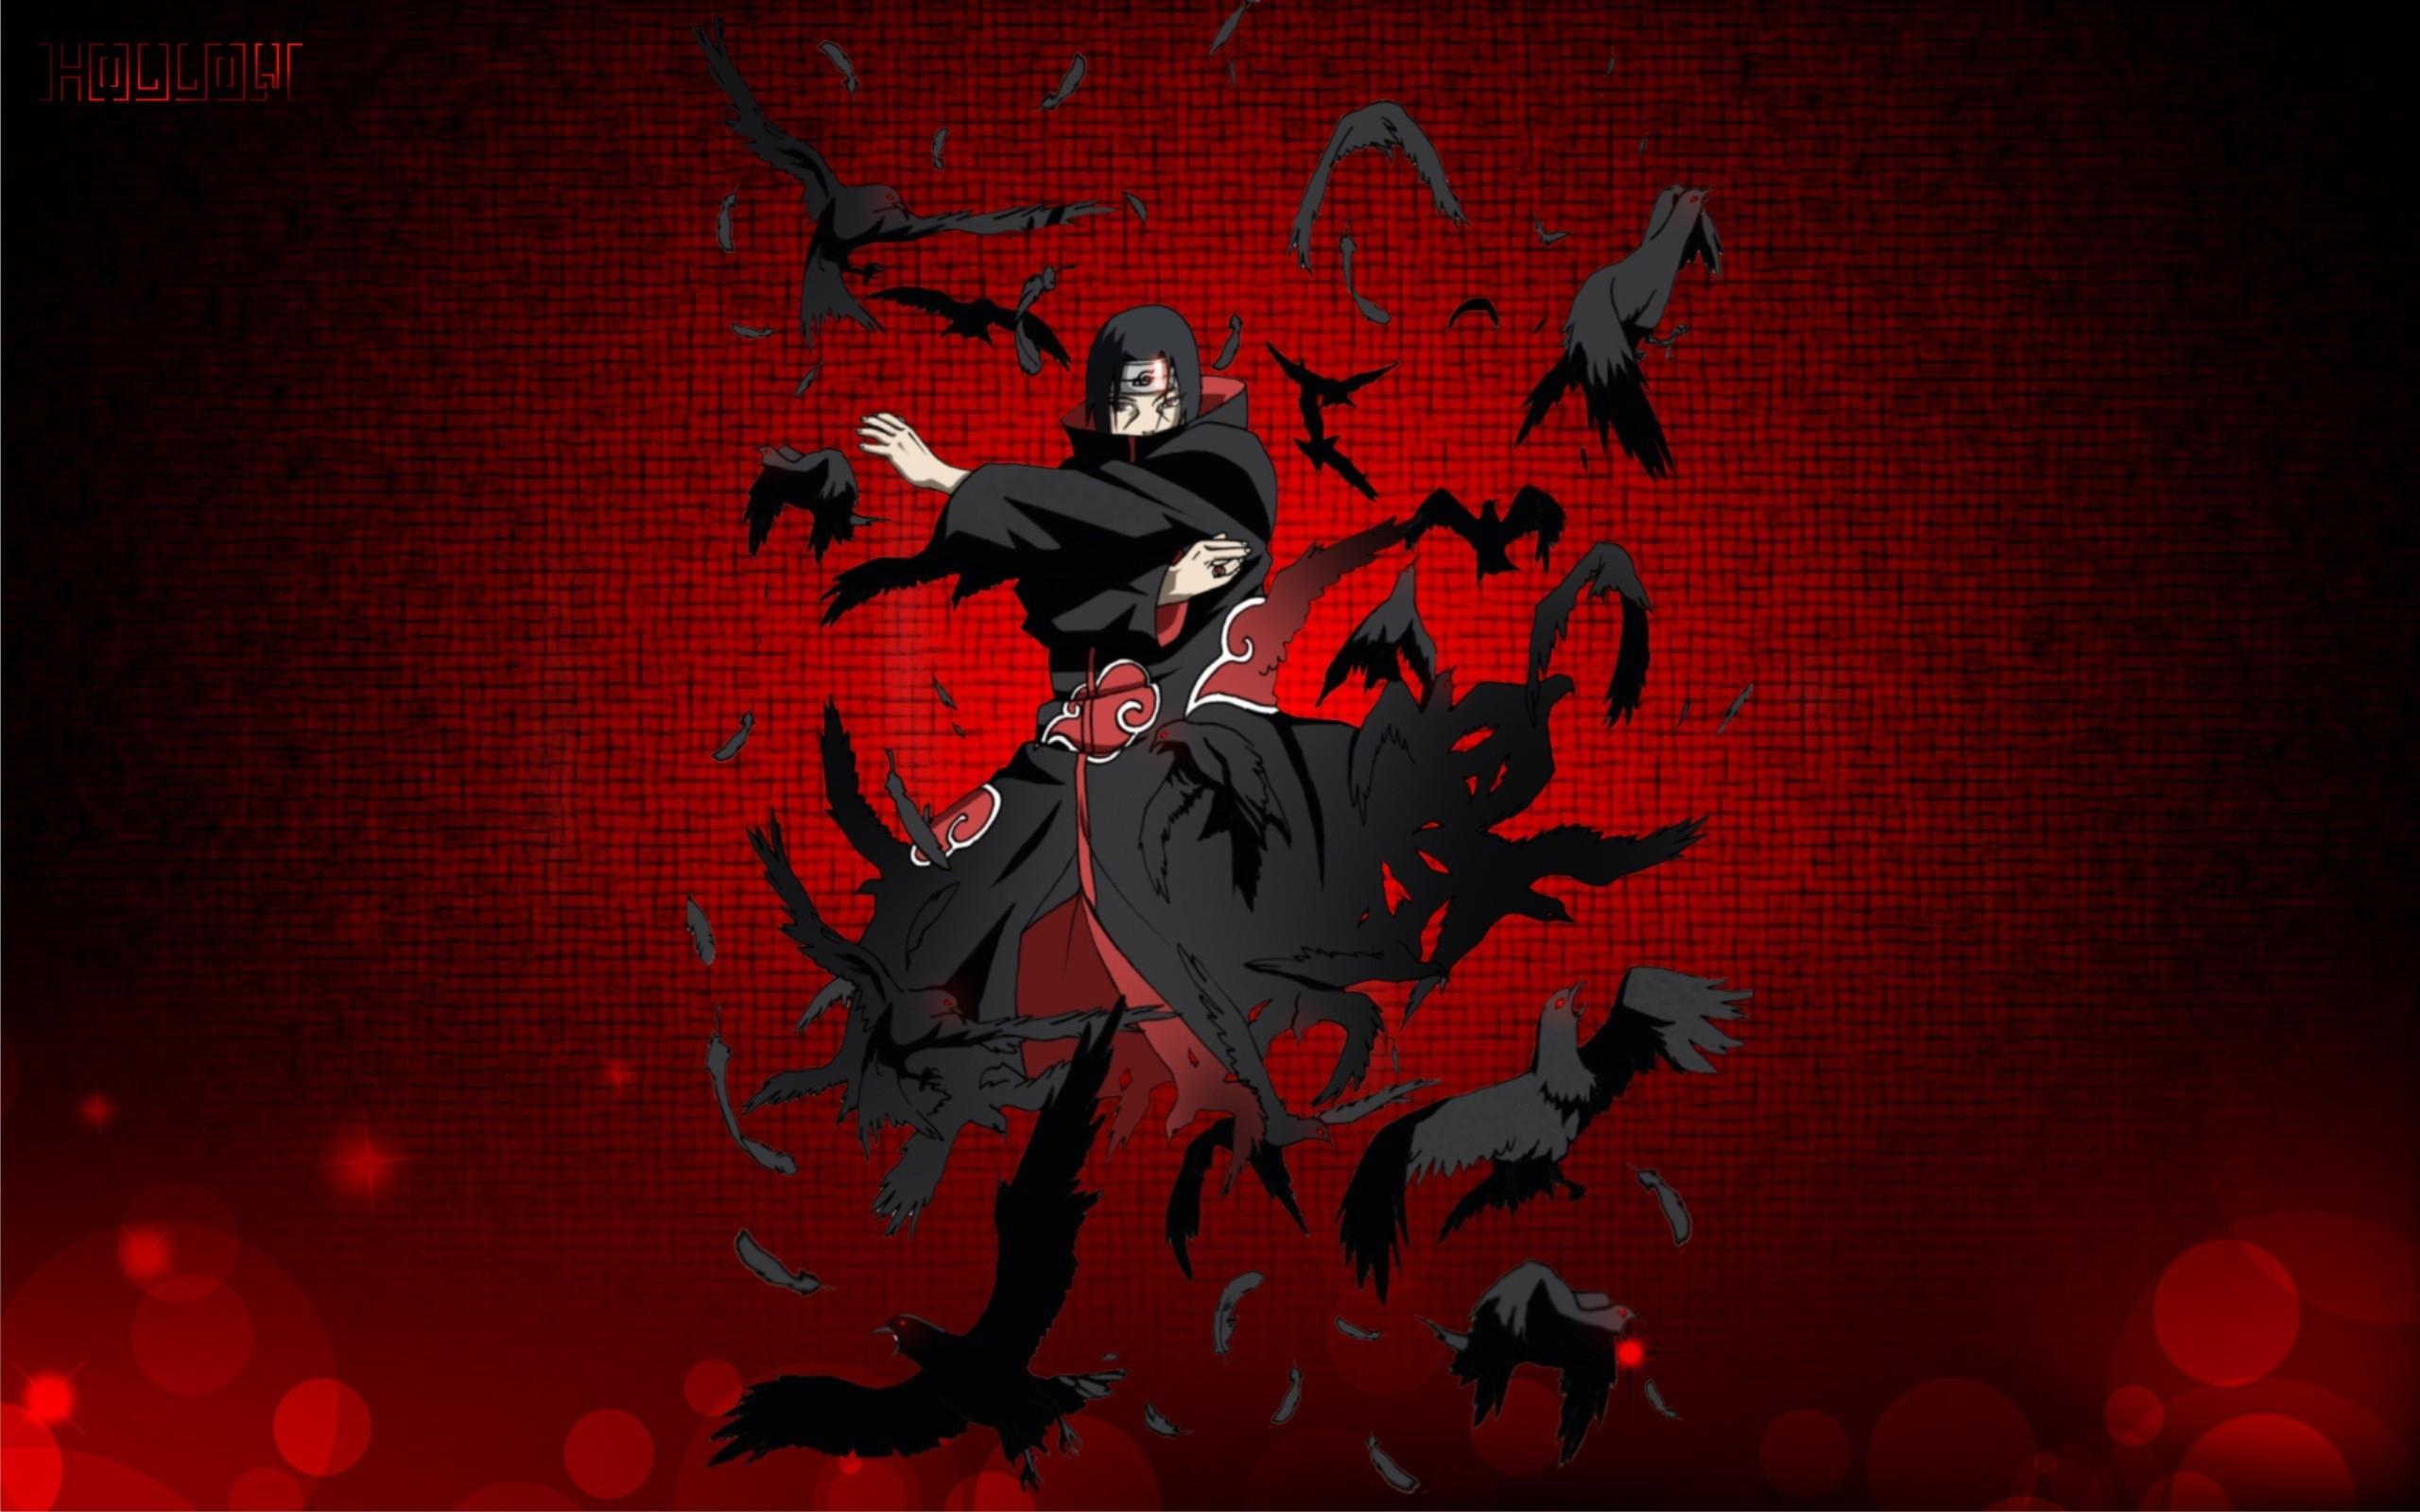 Naruto-Anime-Wallpaper-HD-5-56 naruto cartoon HD free wallpapers